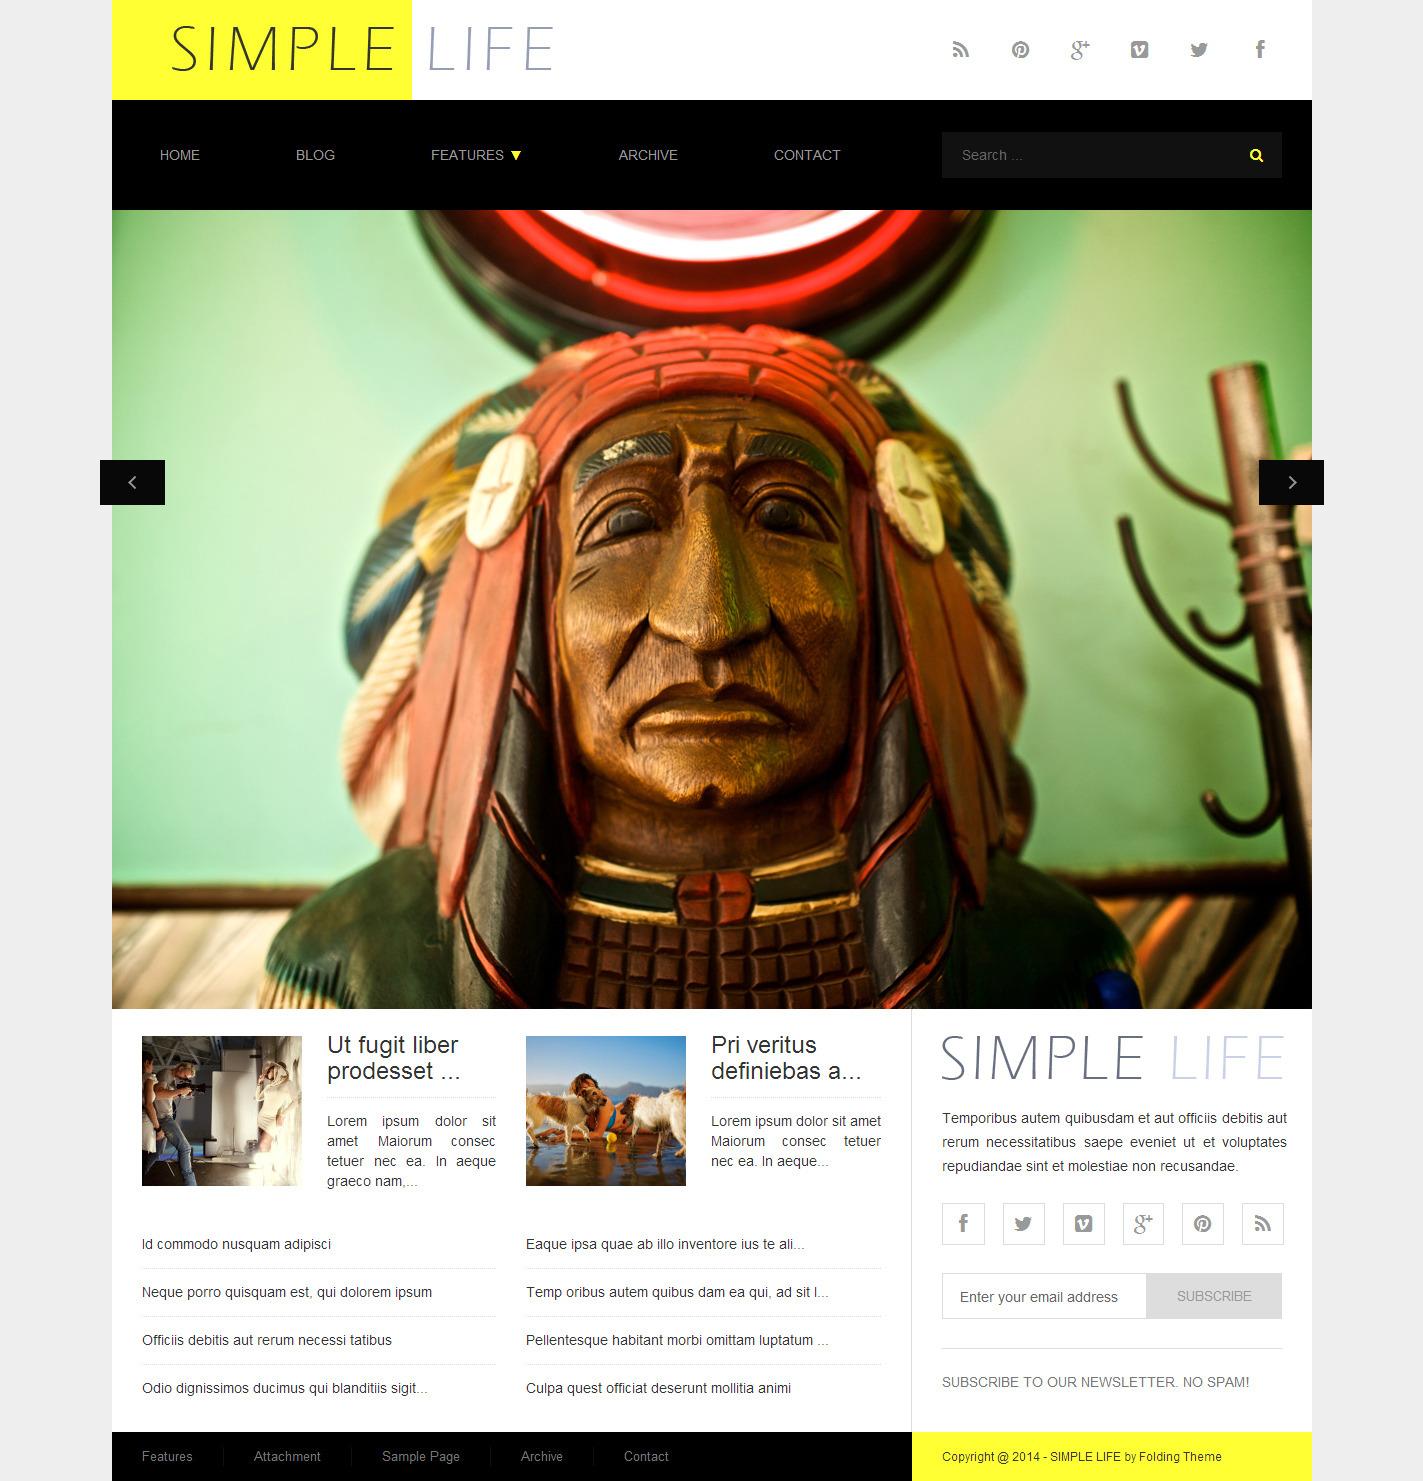 Simple Life - WordPress Blog Theme, AdSense Ready - simple life wordpress theme - attachment template